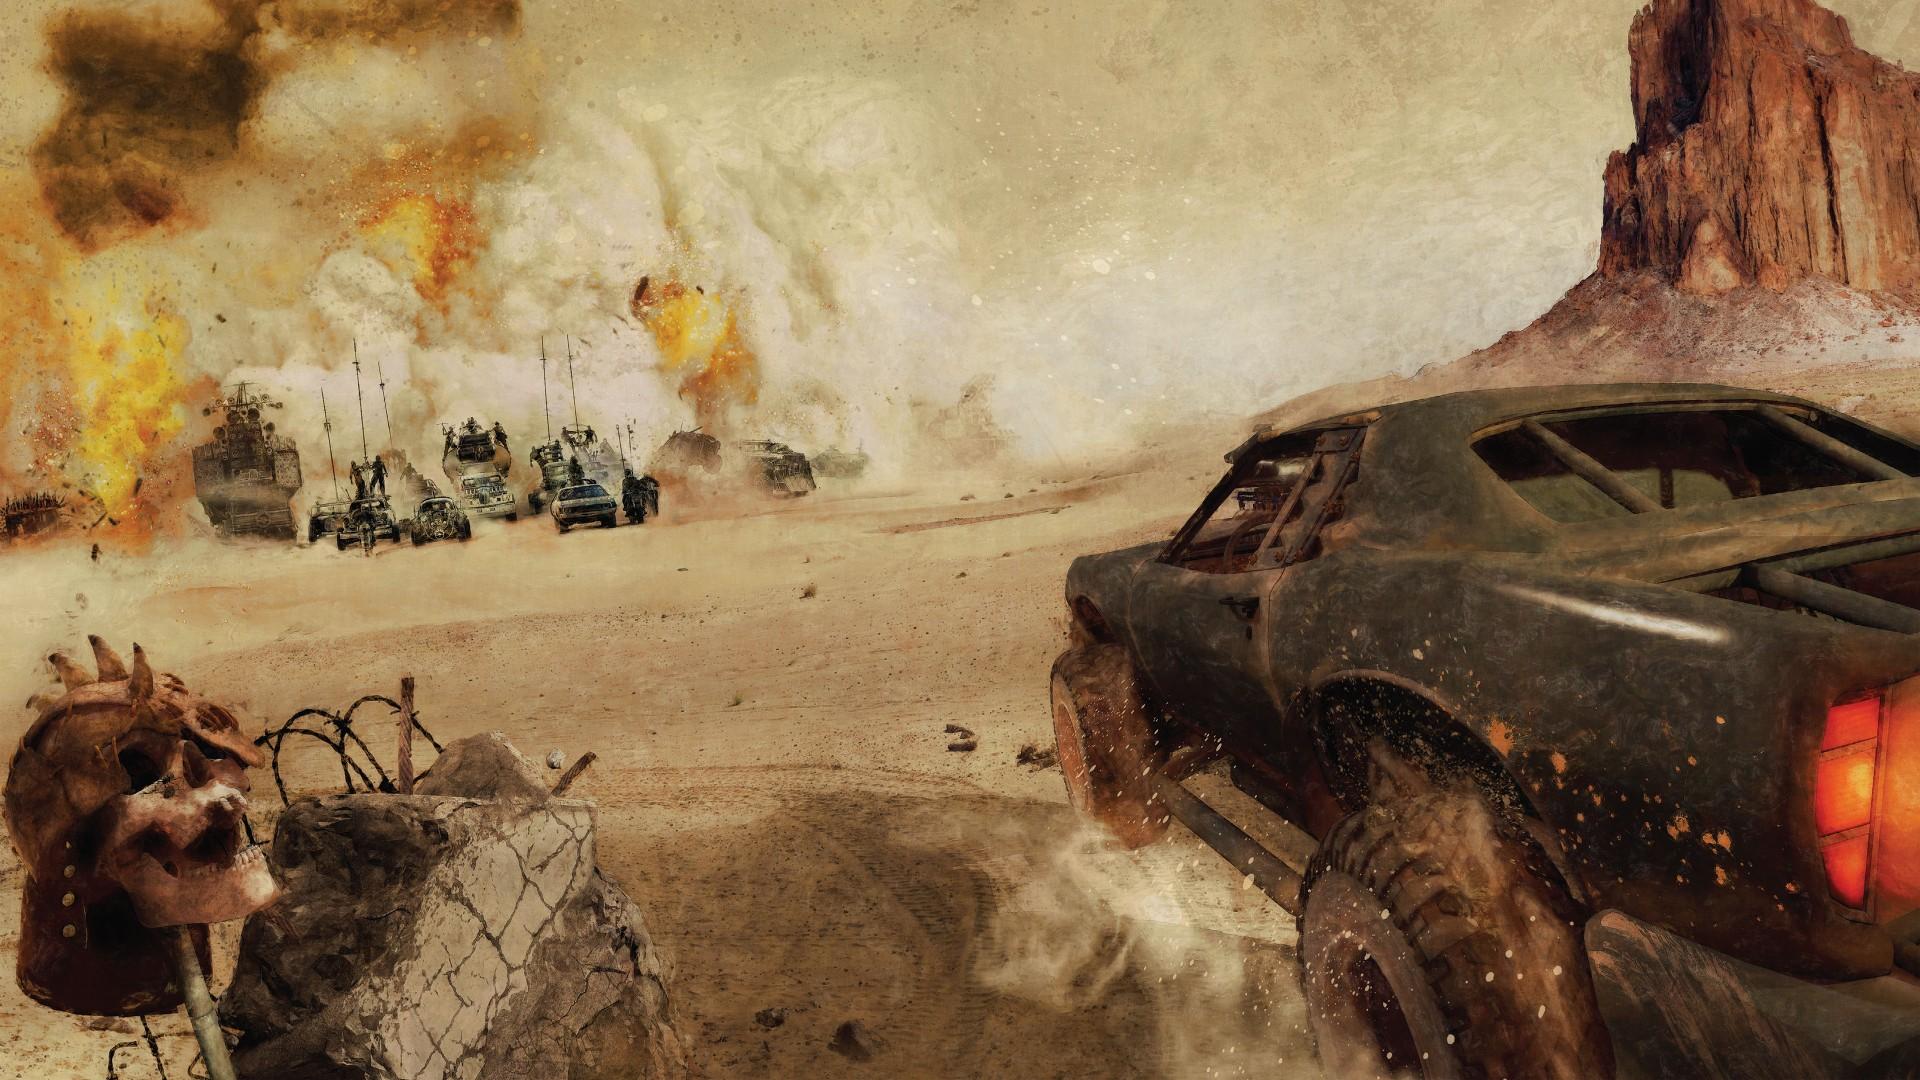 1920x1080 Px Mad Max Fury